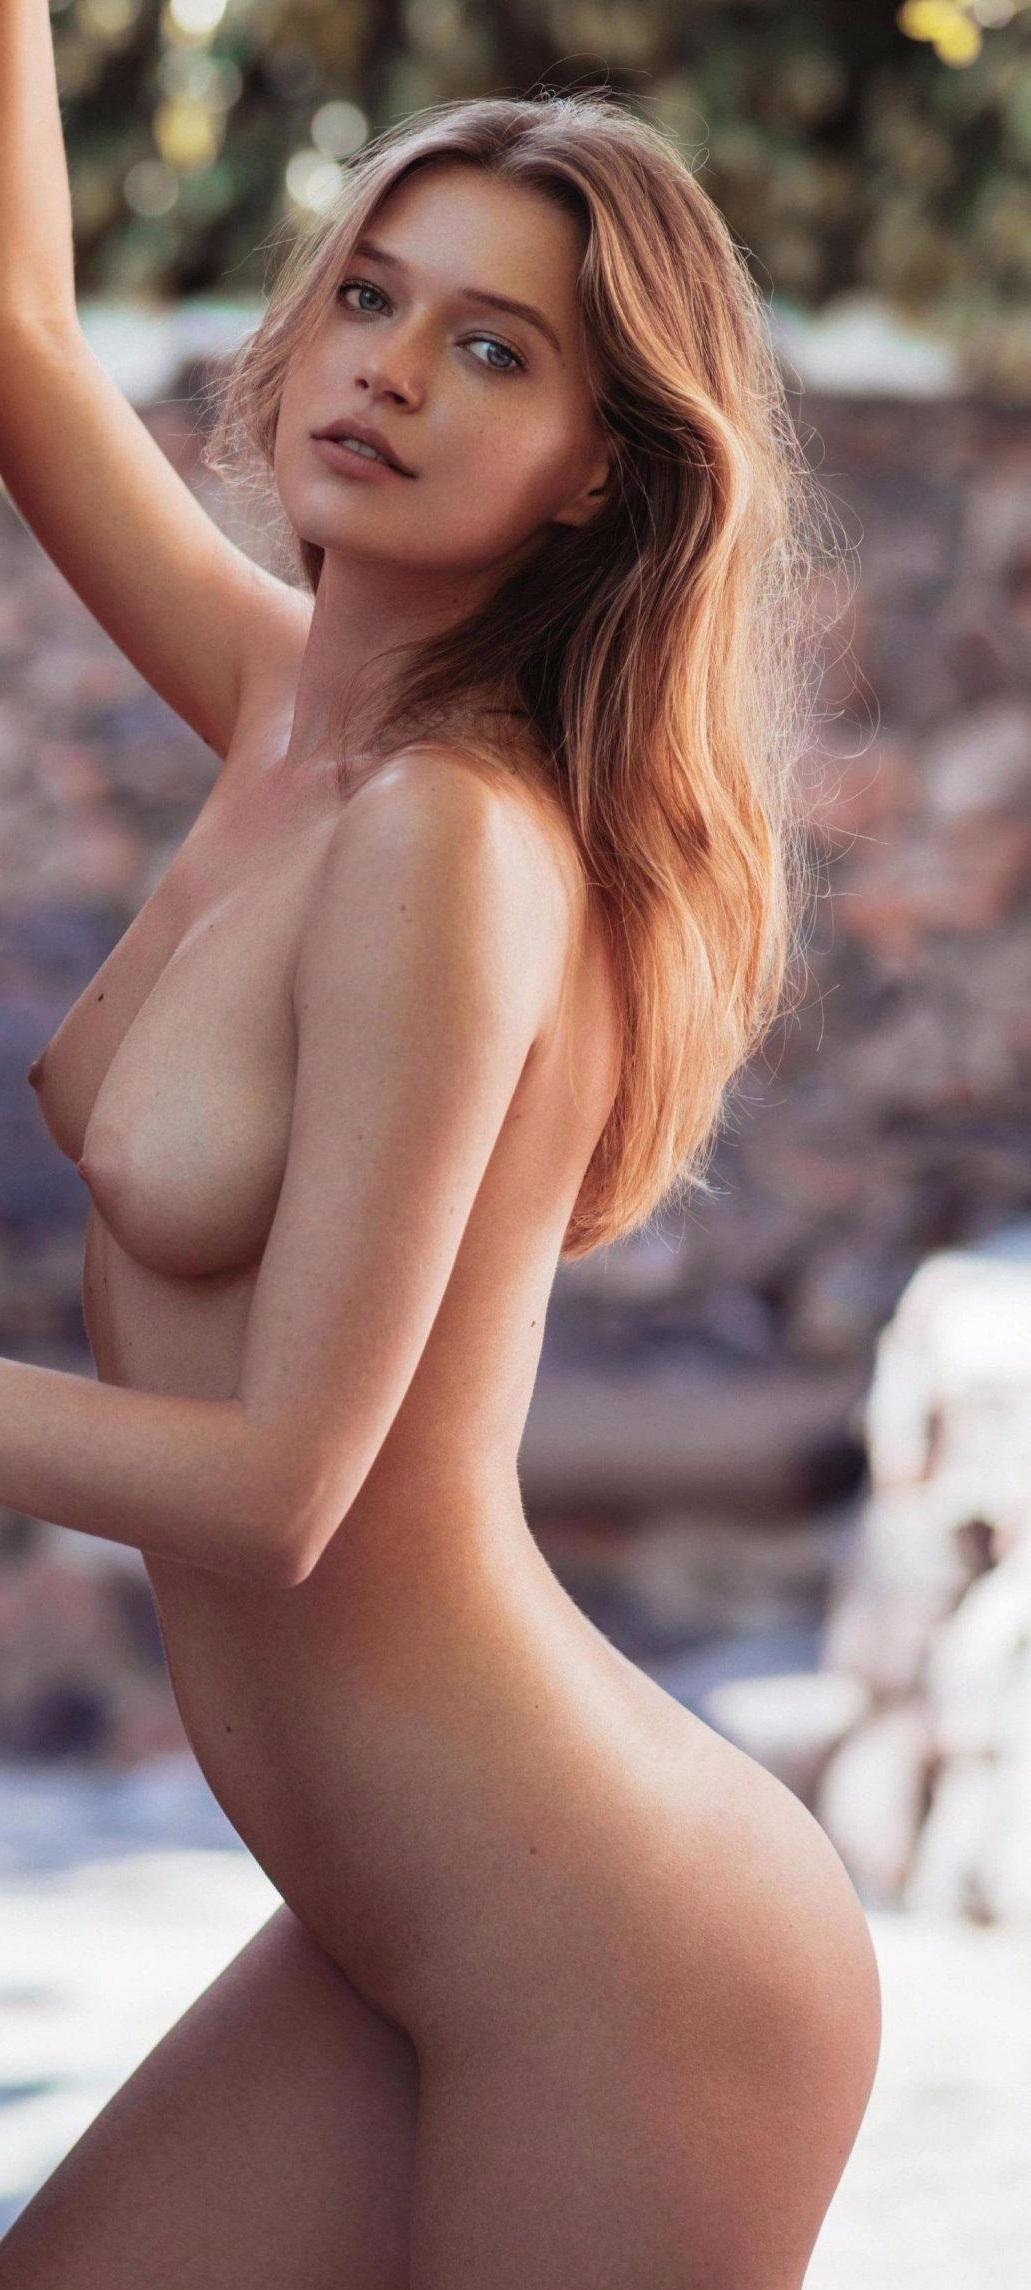 Asian hot mom mature naked